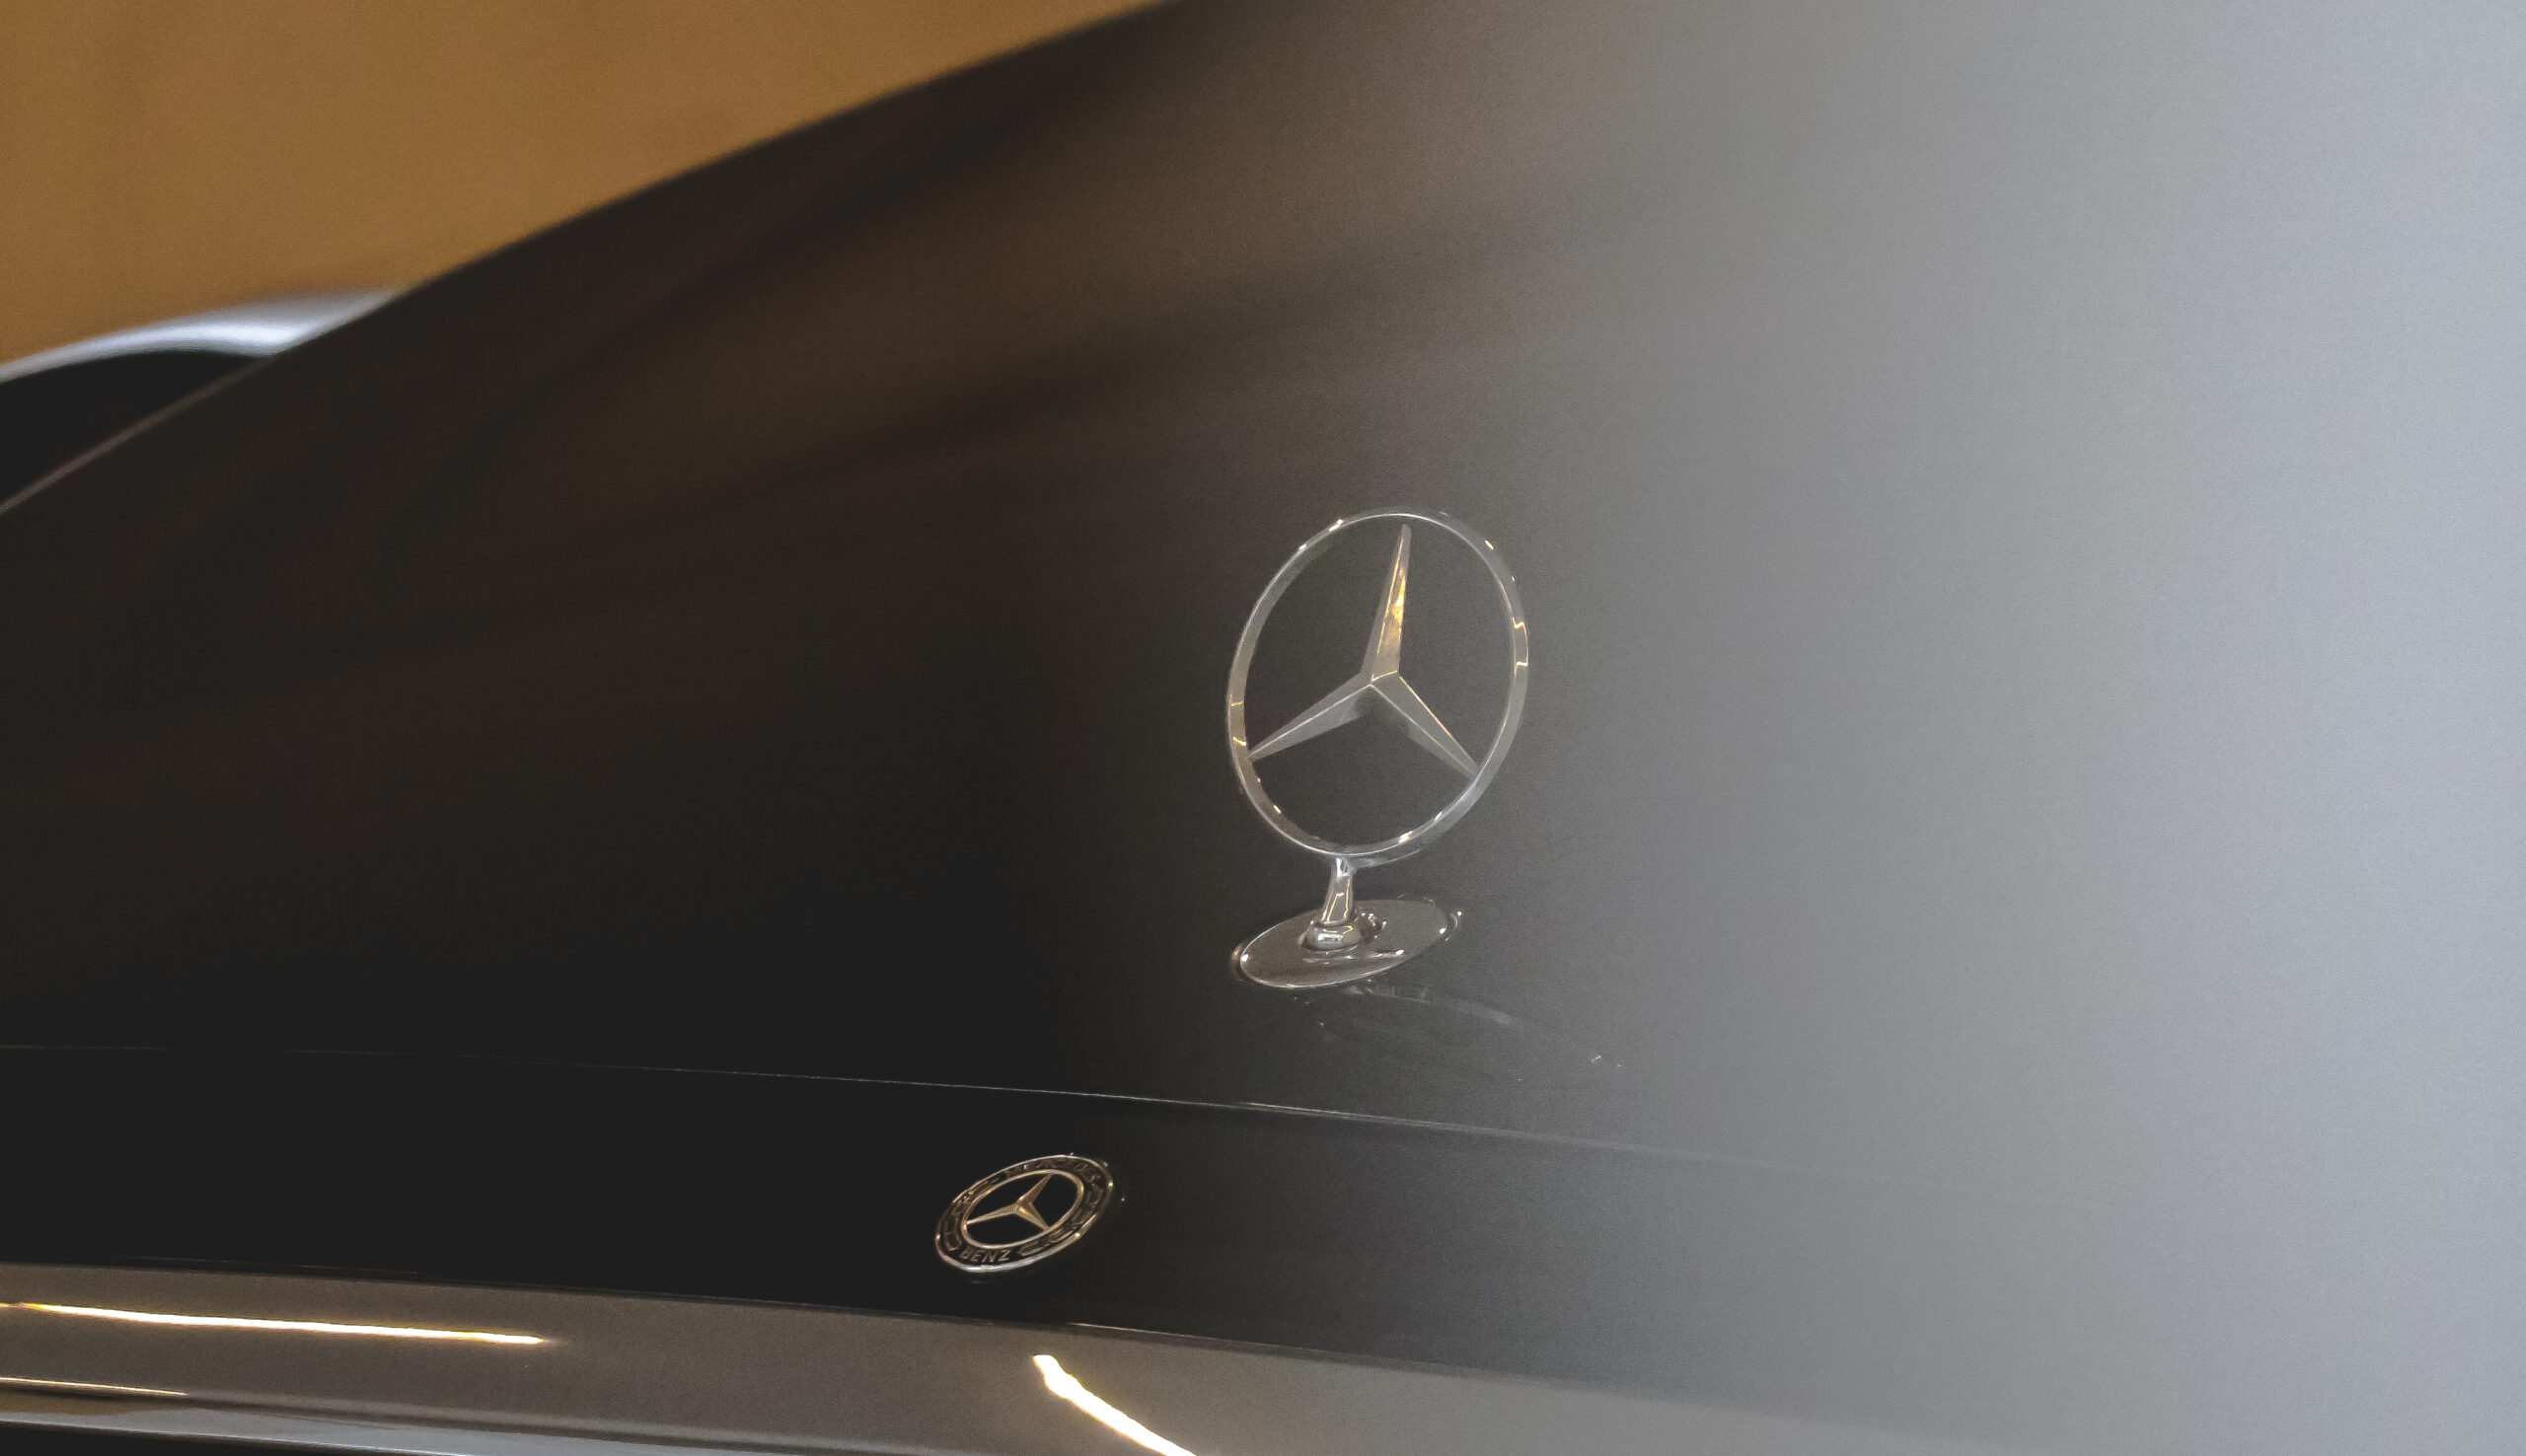 Mercedes Benz collaborates with DSEU